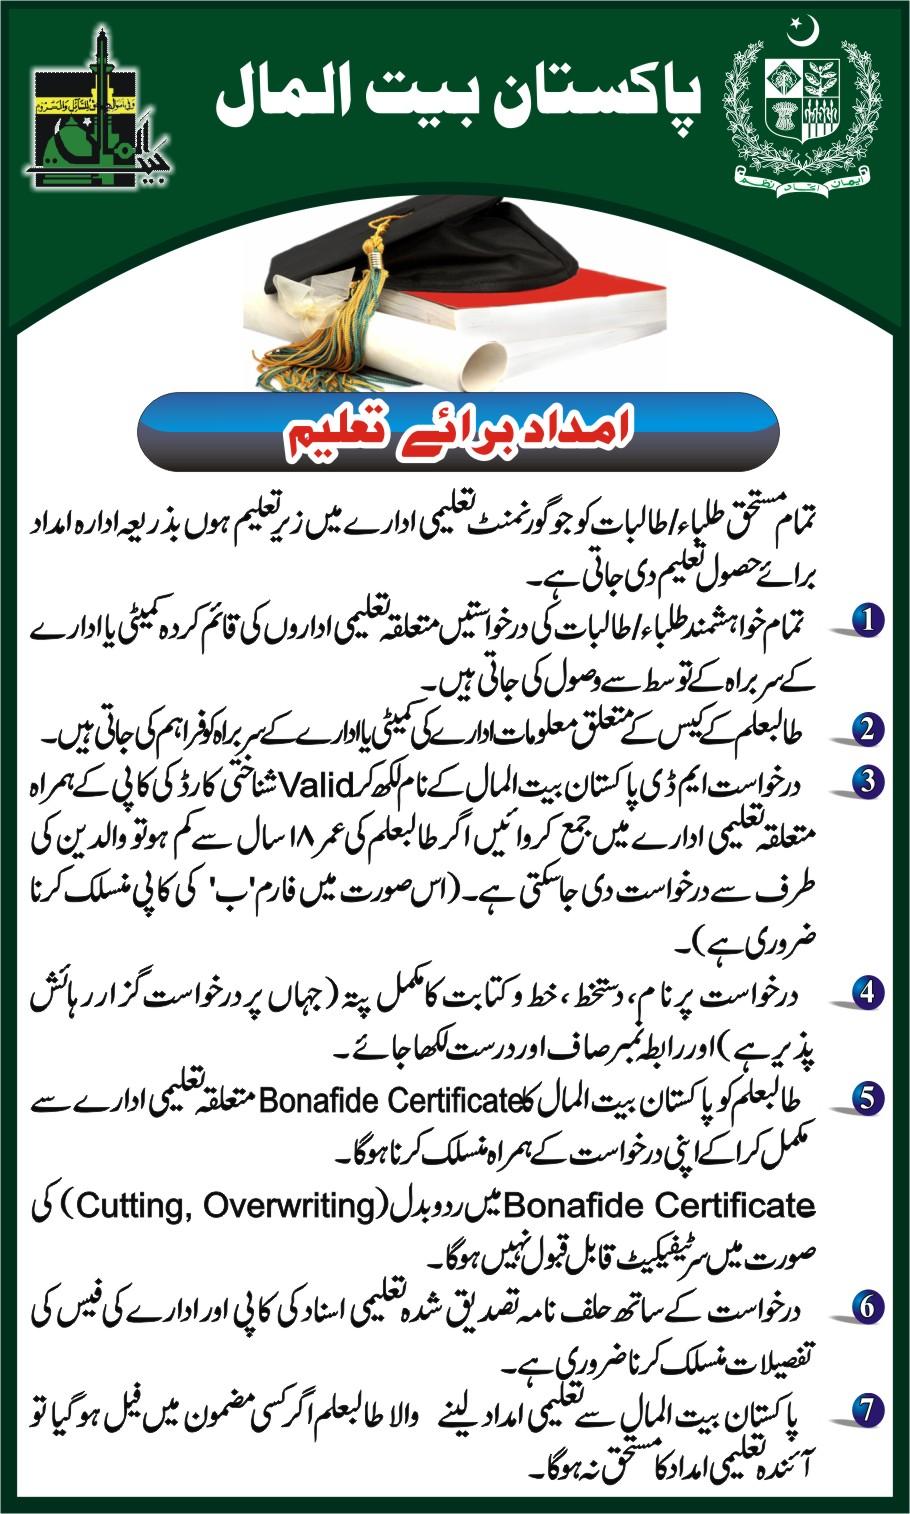 Pakistan Baitulmal Scholarship 2018 Form Application Free Download